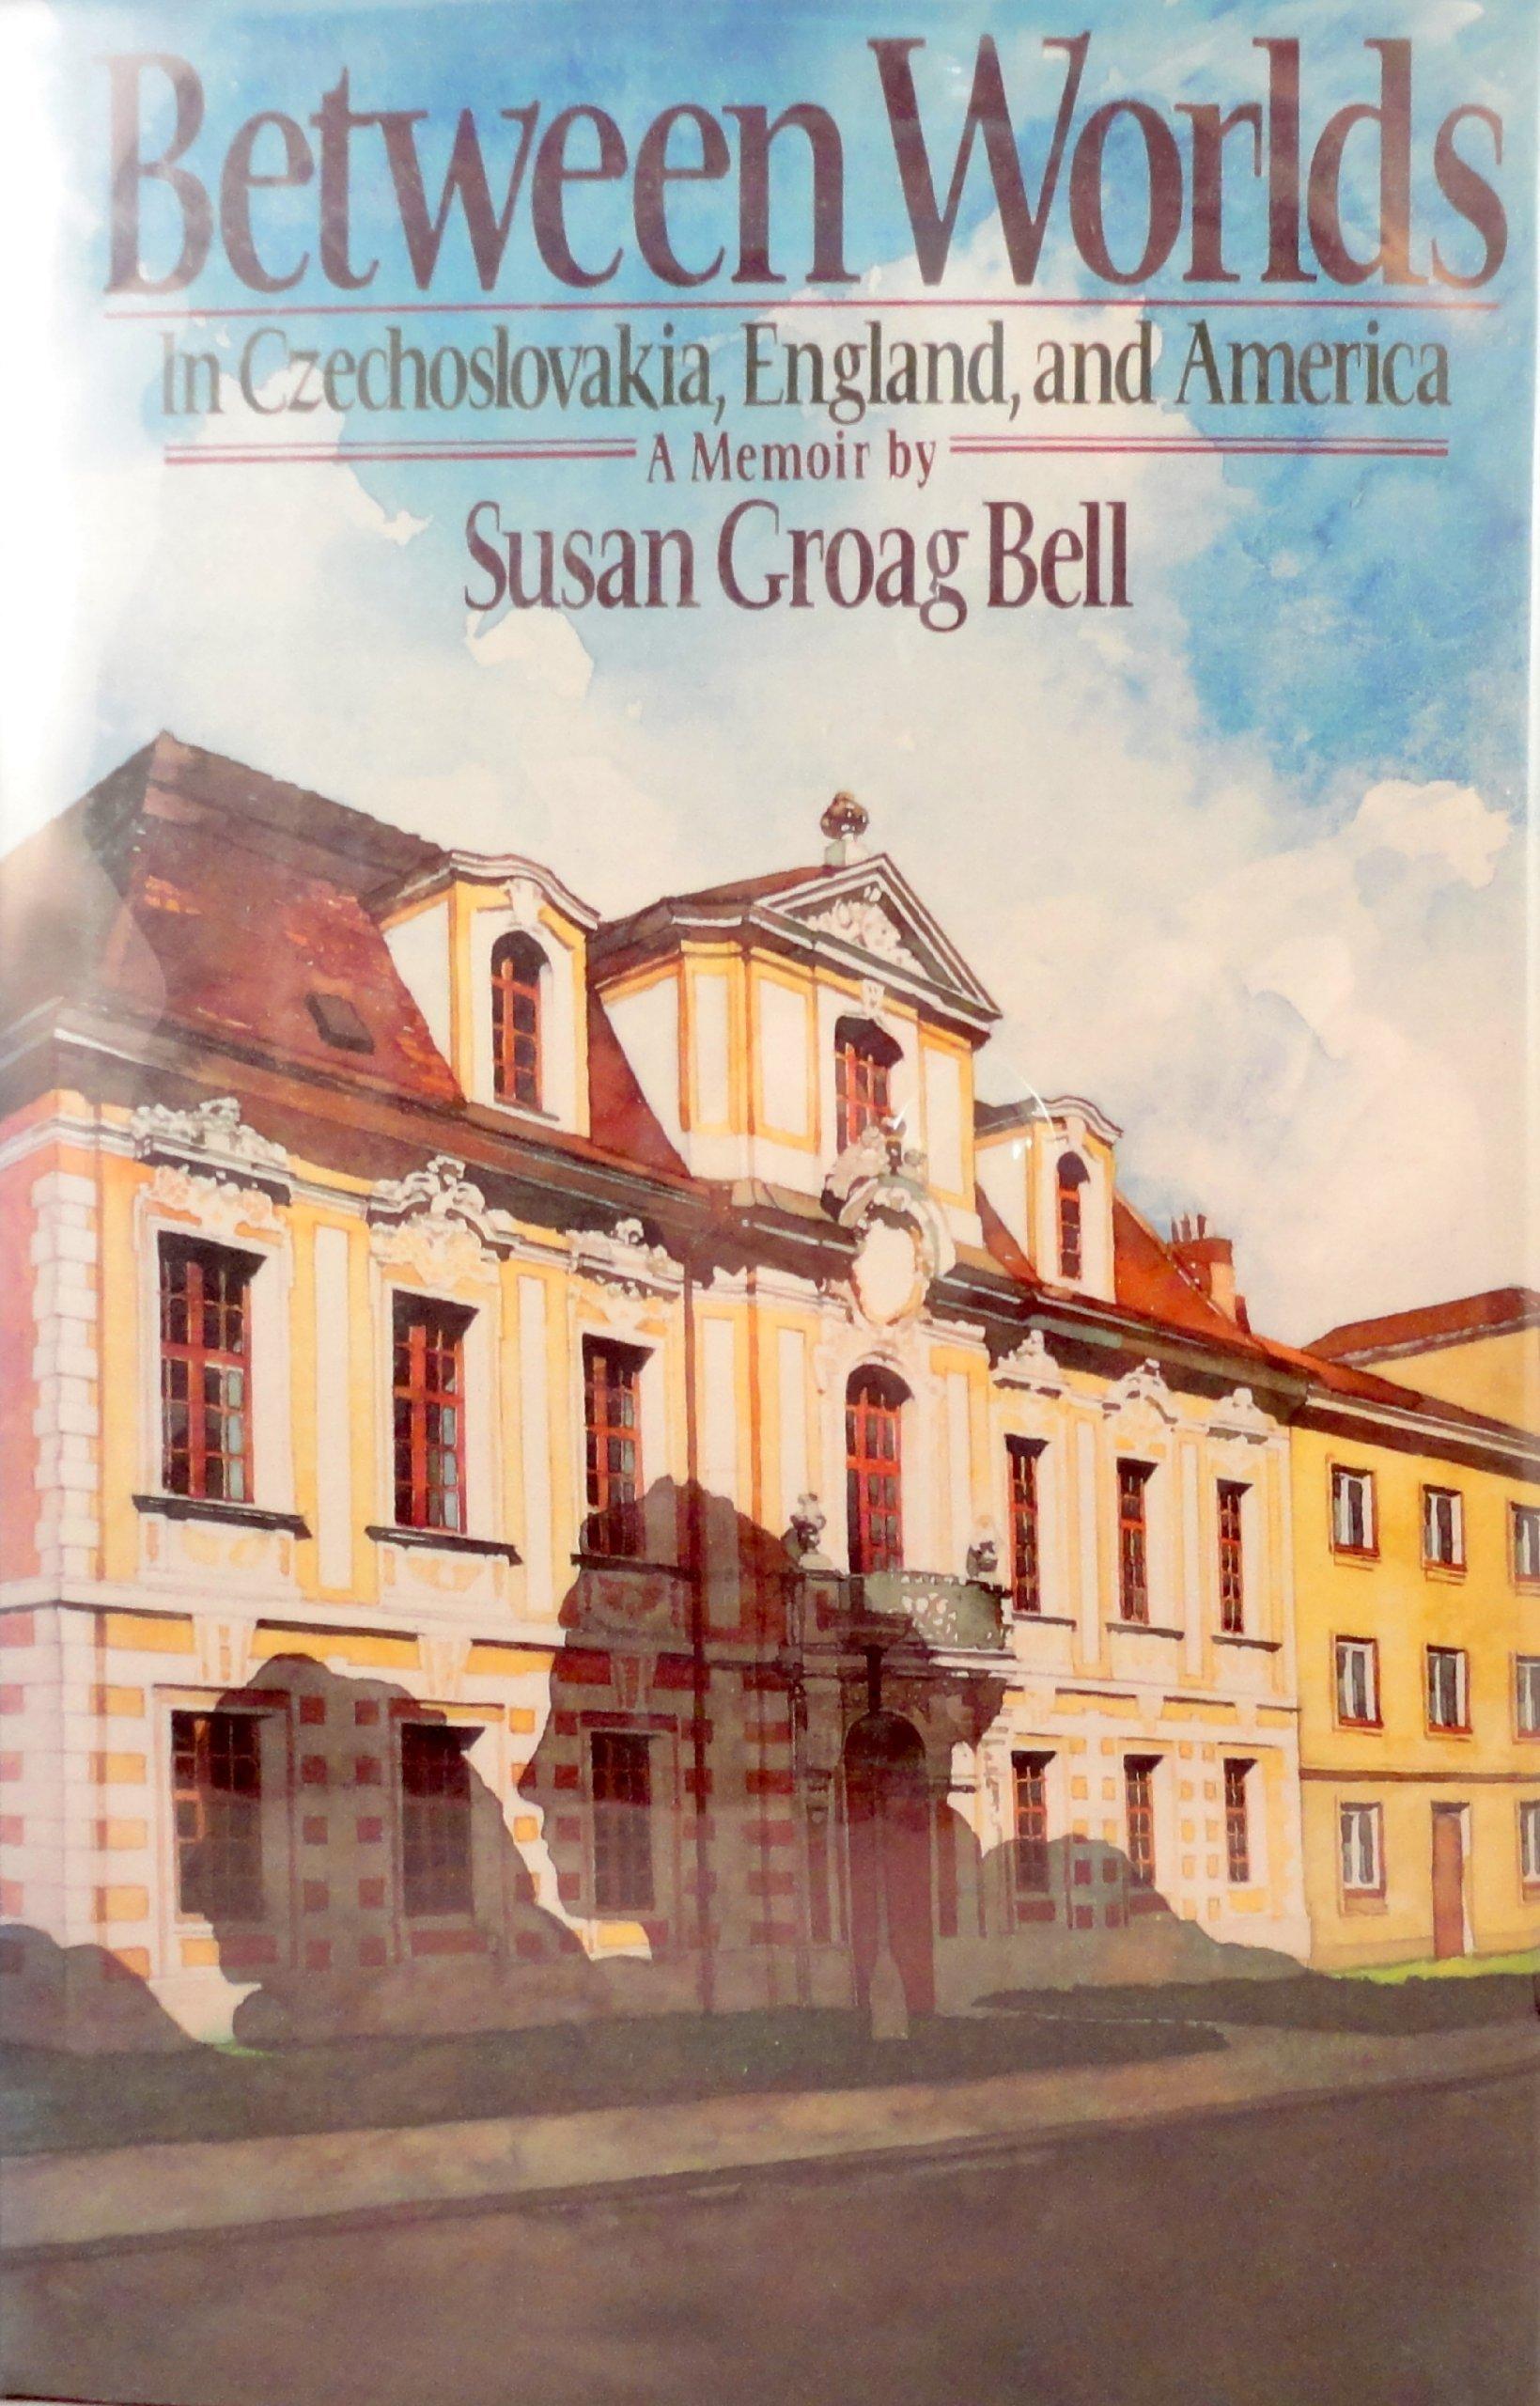 Between Worlds: In Czechoslovakia, England, and America: A Memoir